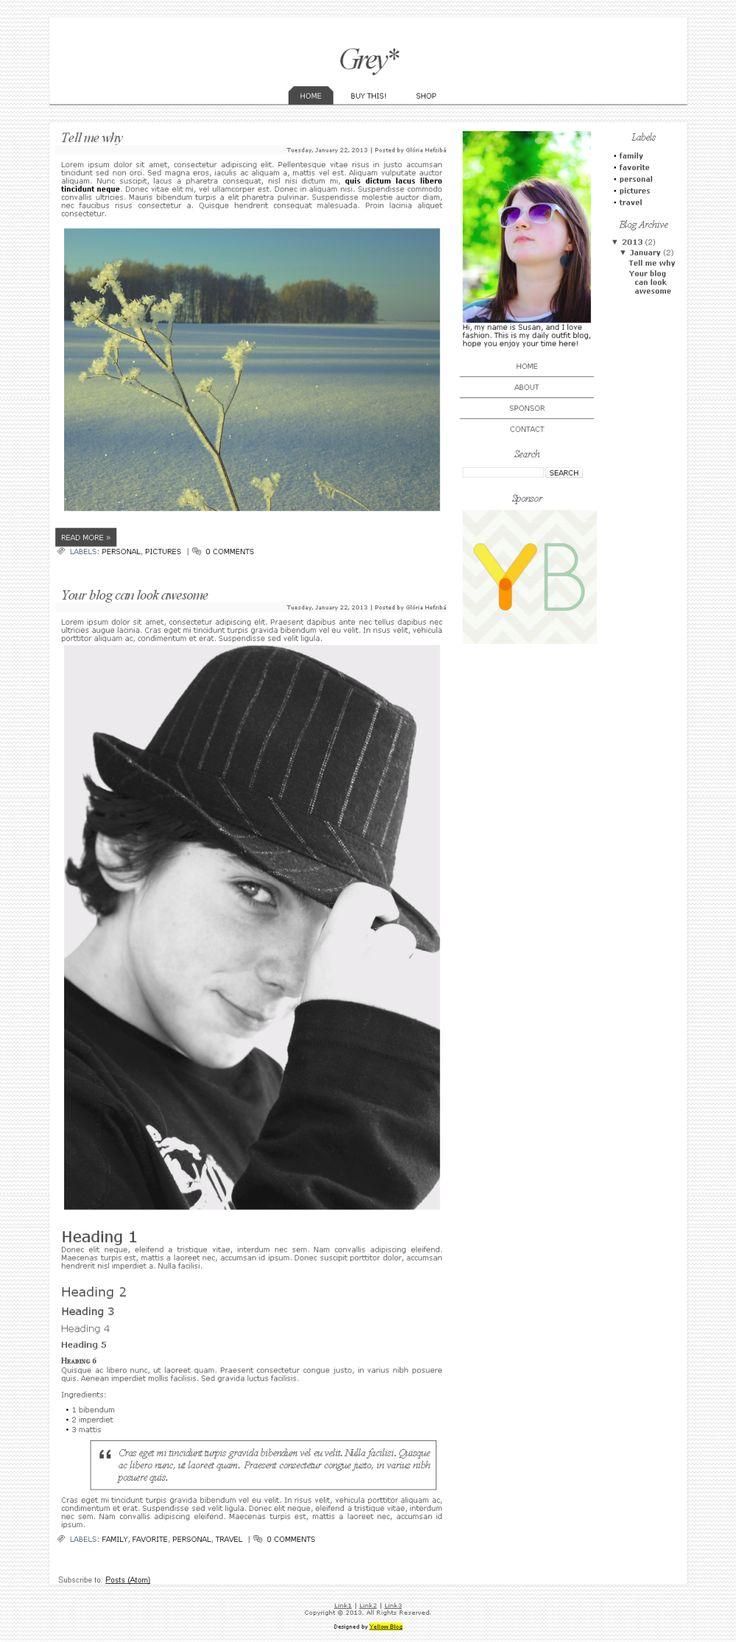 Grey - Blogger, Worpress | Yellow Blog Design | LIVE DEMO http://1312vv.blogspot.com ($20.99) #blog #layout #template #theme #custom #design #blogger #blogspot #wordpress #blogdesign